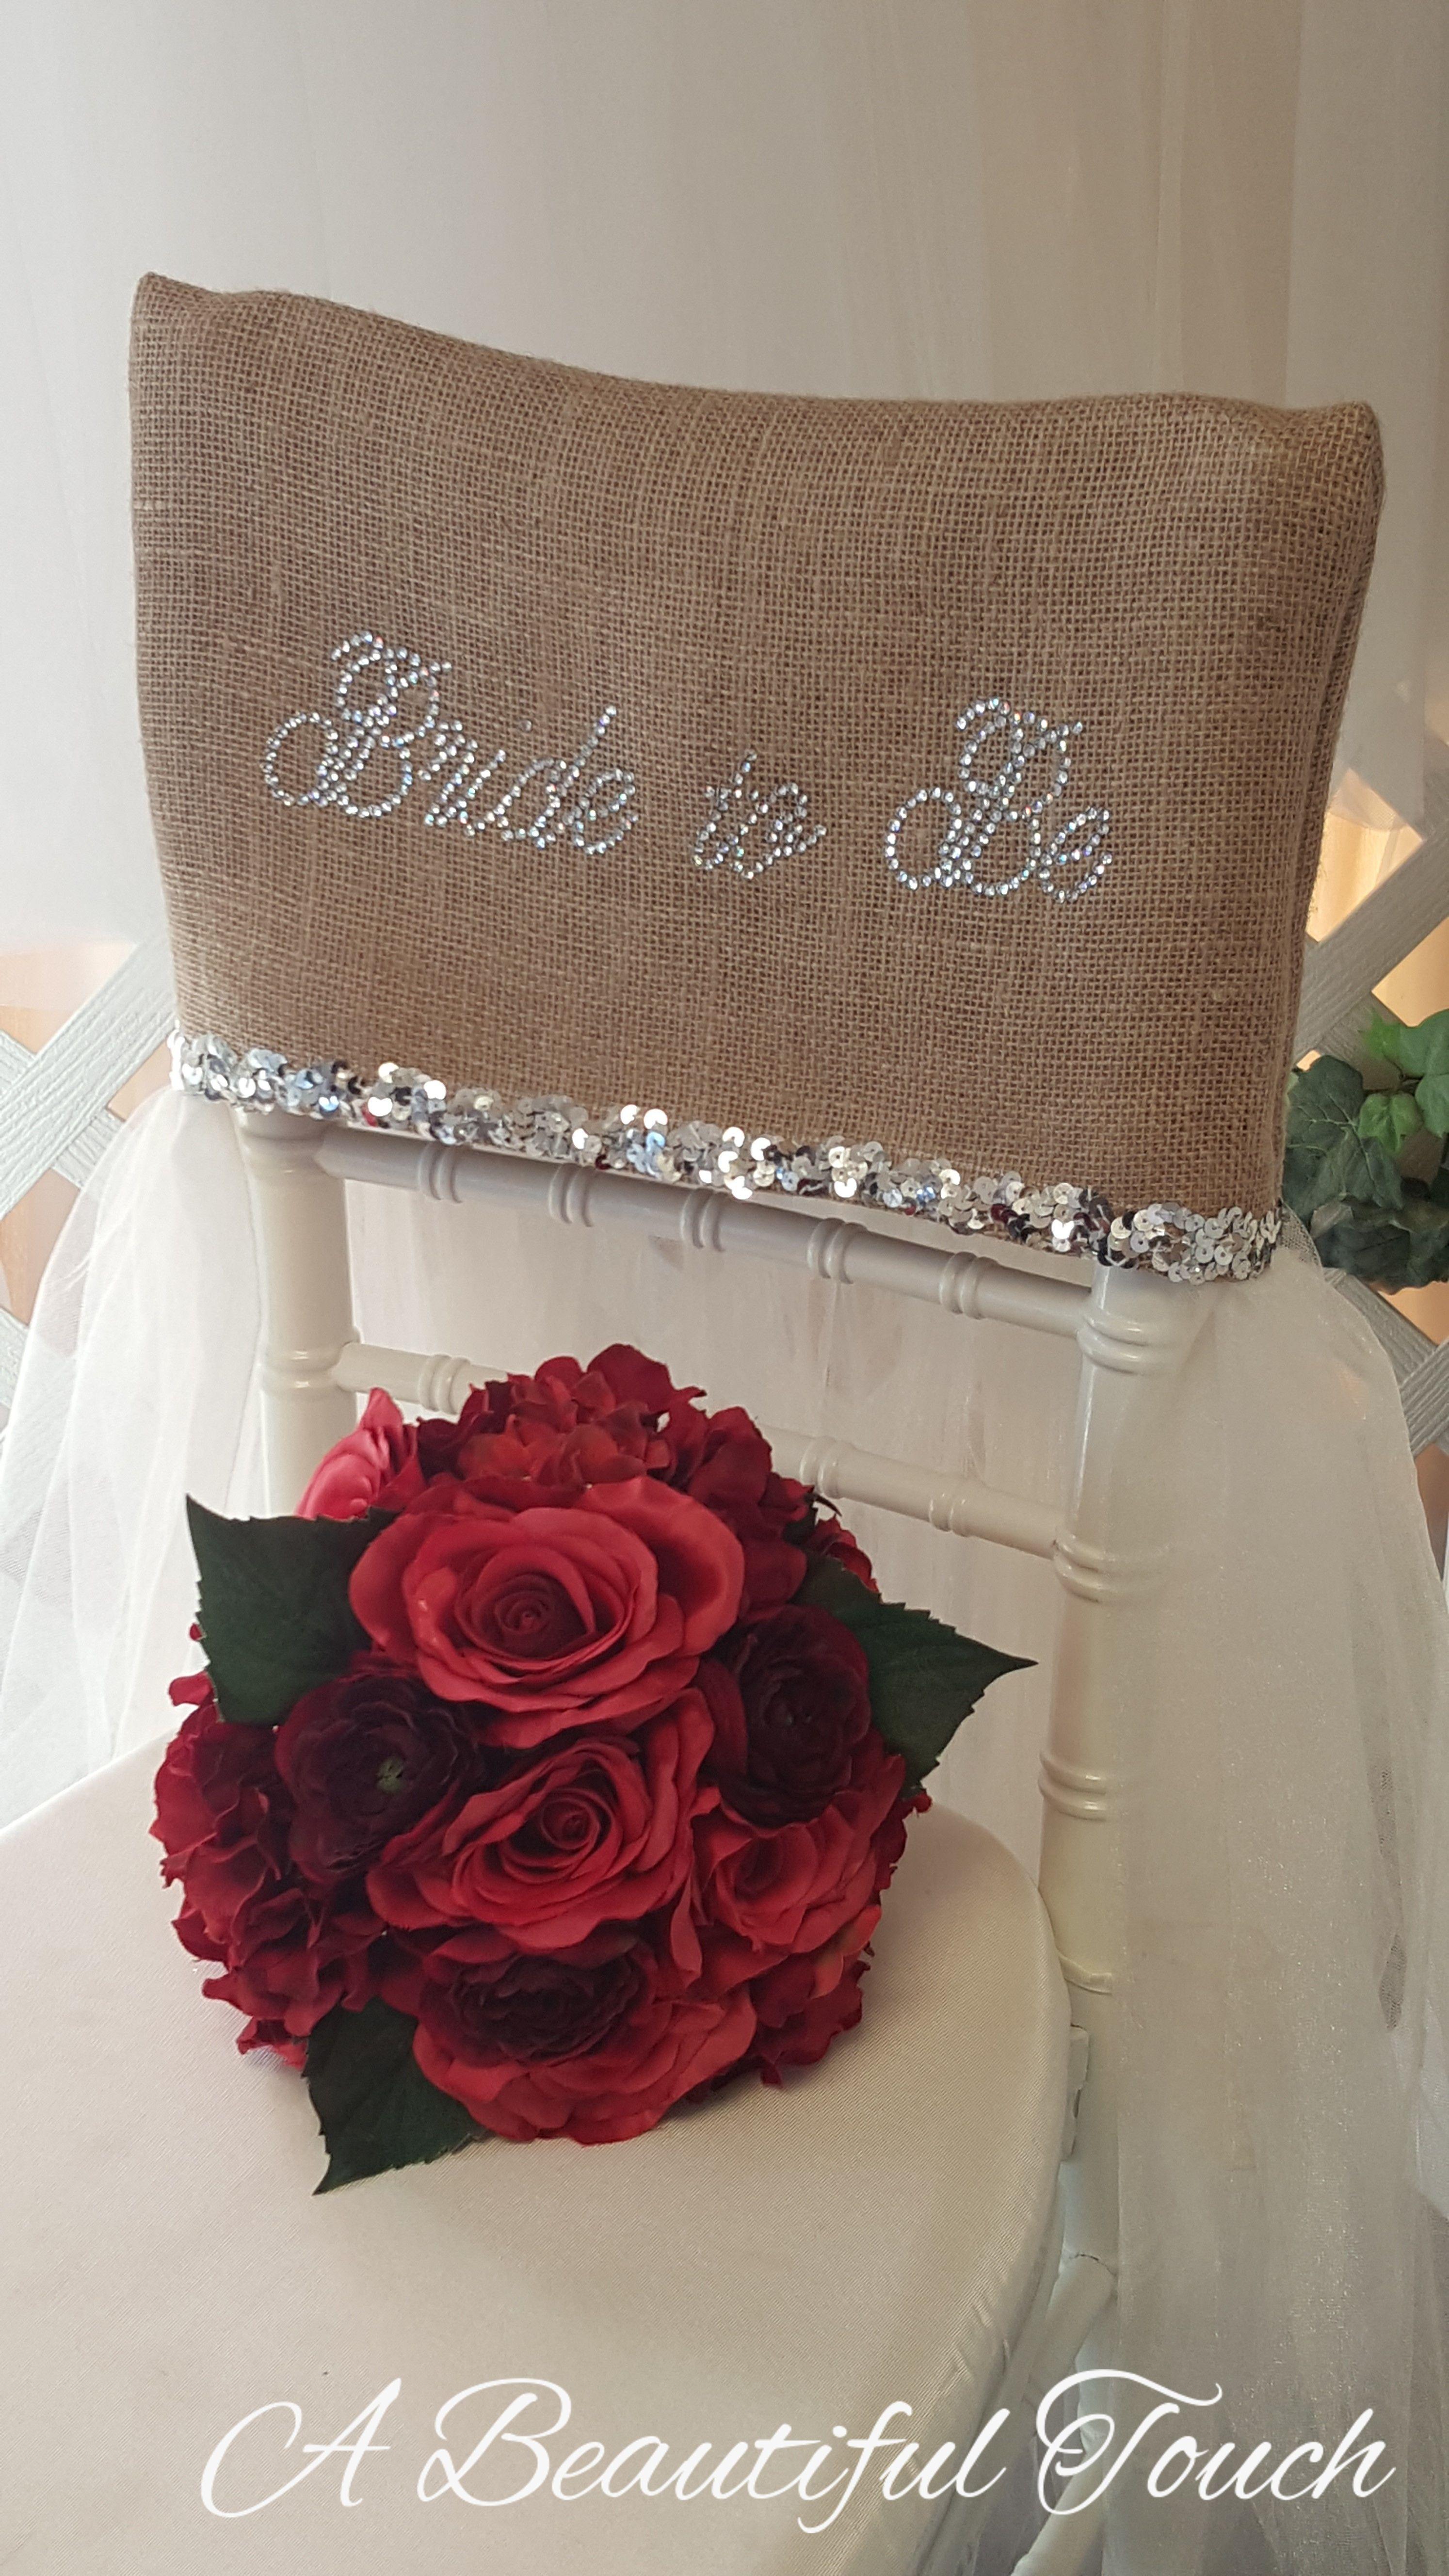 Bridal shower wedding reception rentals logans bridal shower bridal shower wedding reception rentals junglespirit Choice Image